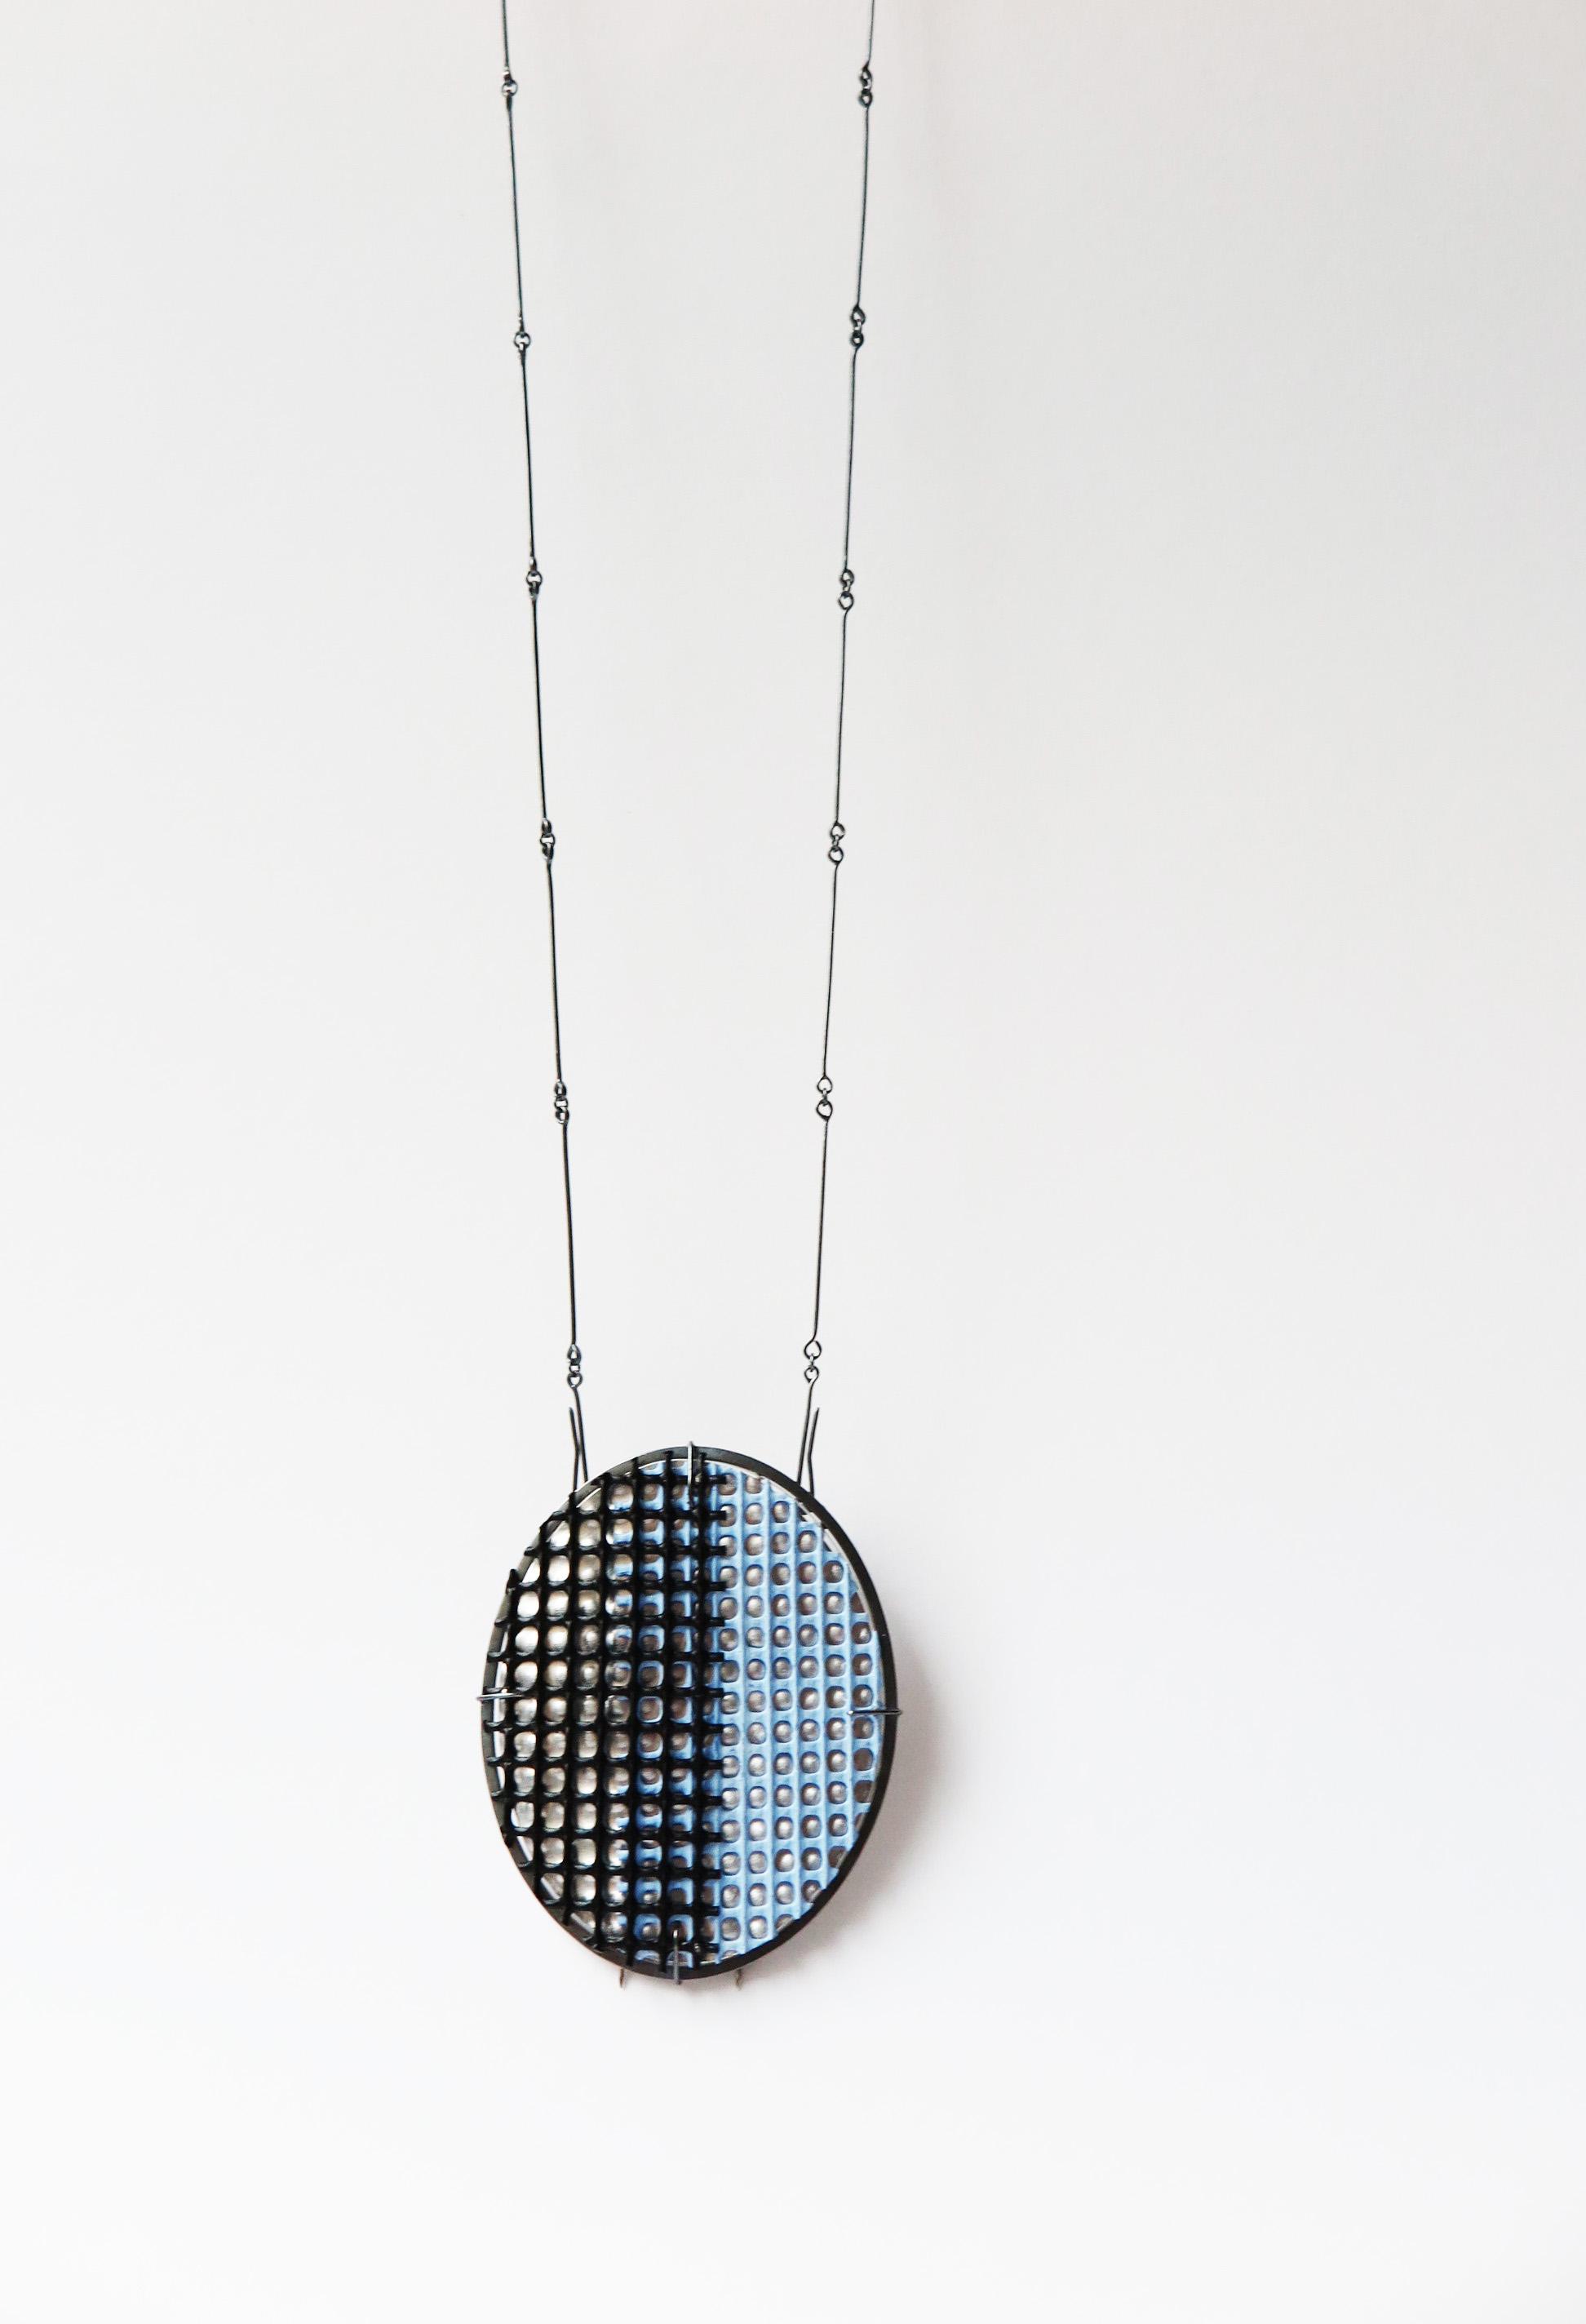 (4-2) layered brooch(pendant)_pale blue_6.5í¬0.7í¬8(H)cm length worn 38cm_sterling silver, aluminum, plastic mesh, acrylic, pigment_2021